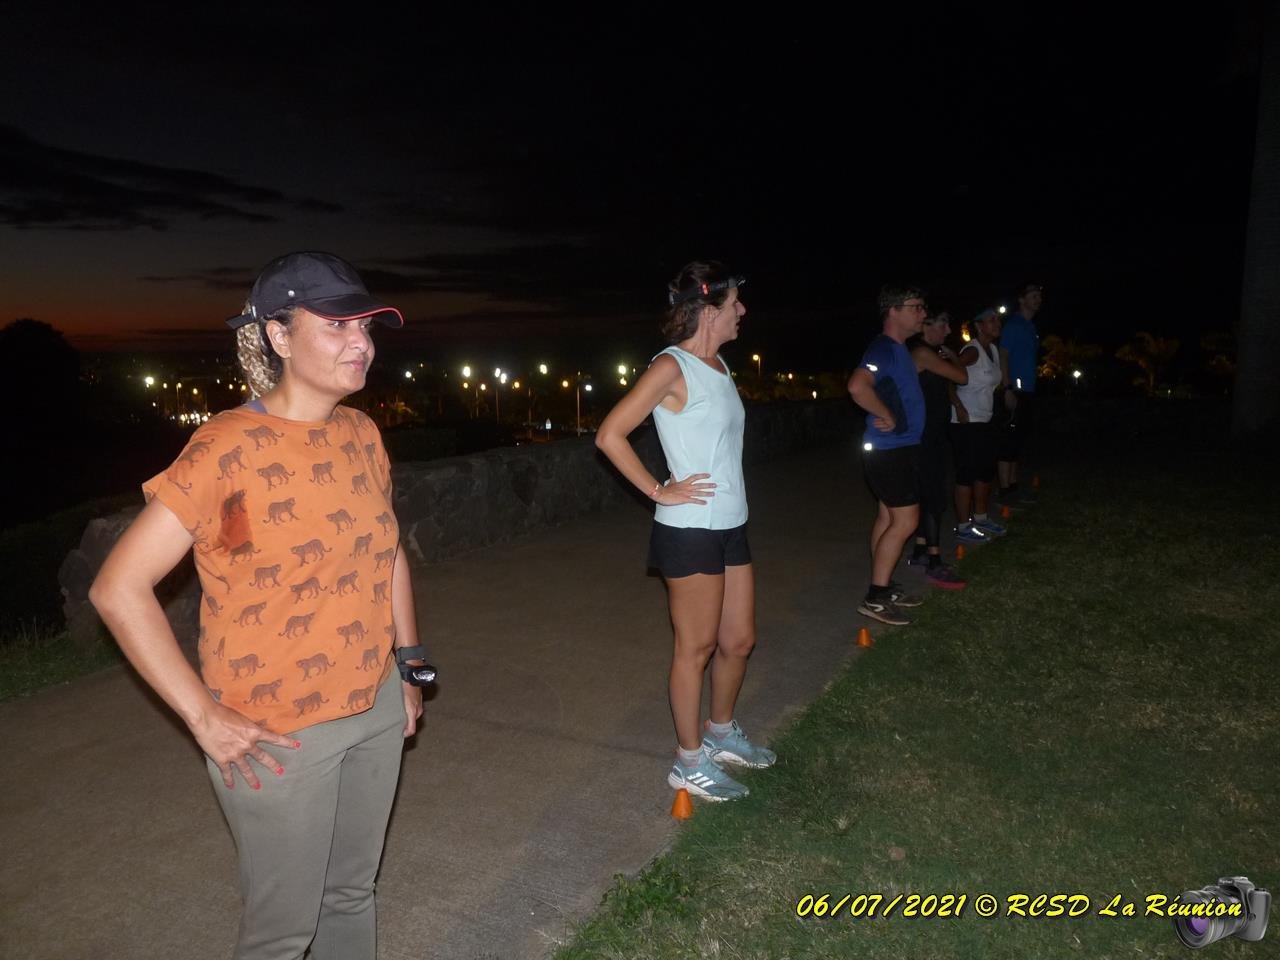 20210706 Entrain Trail Trinité 005